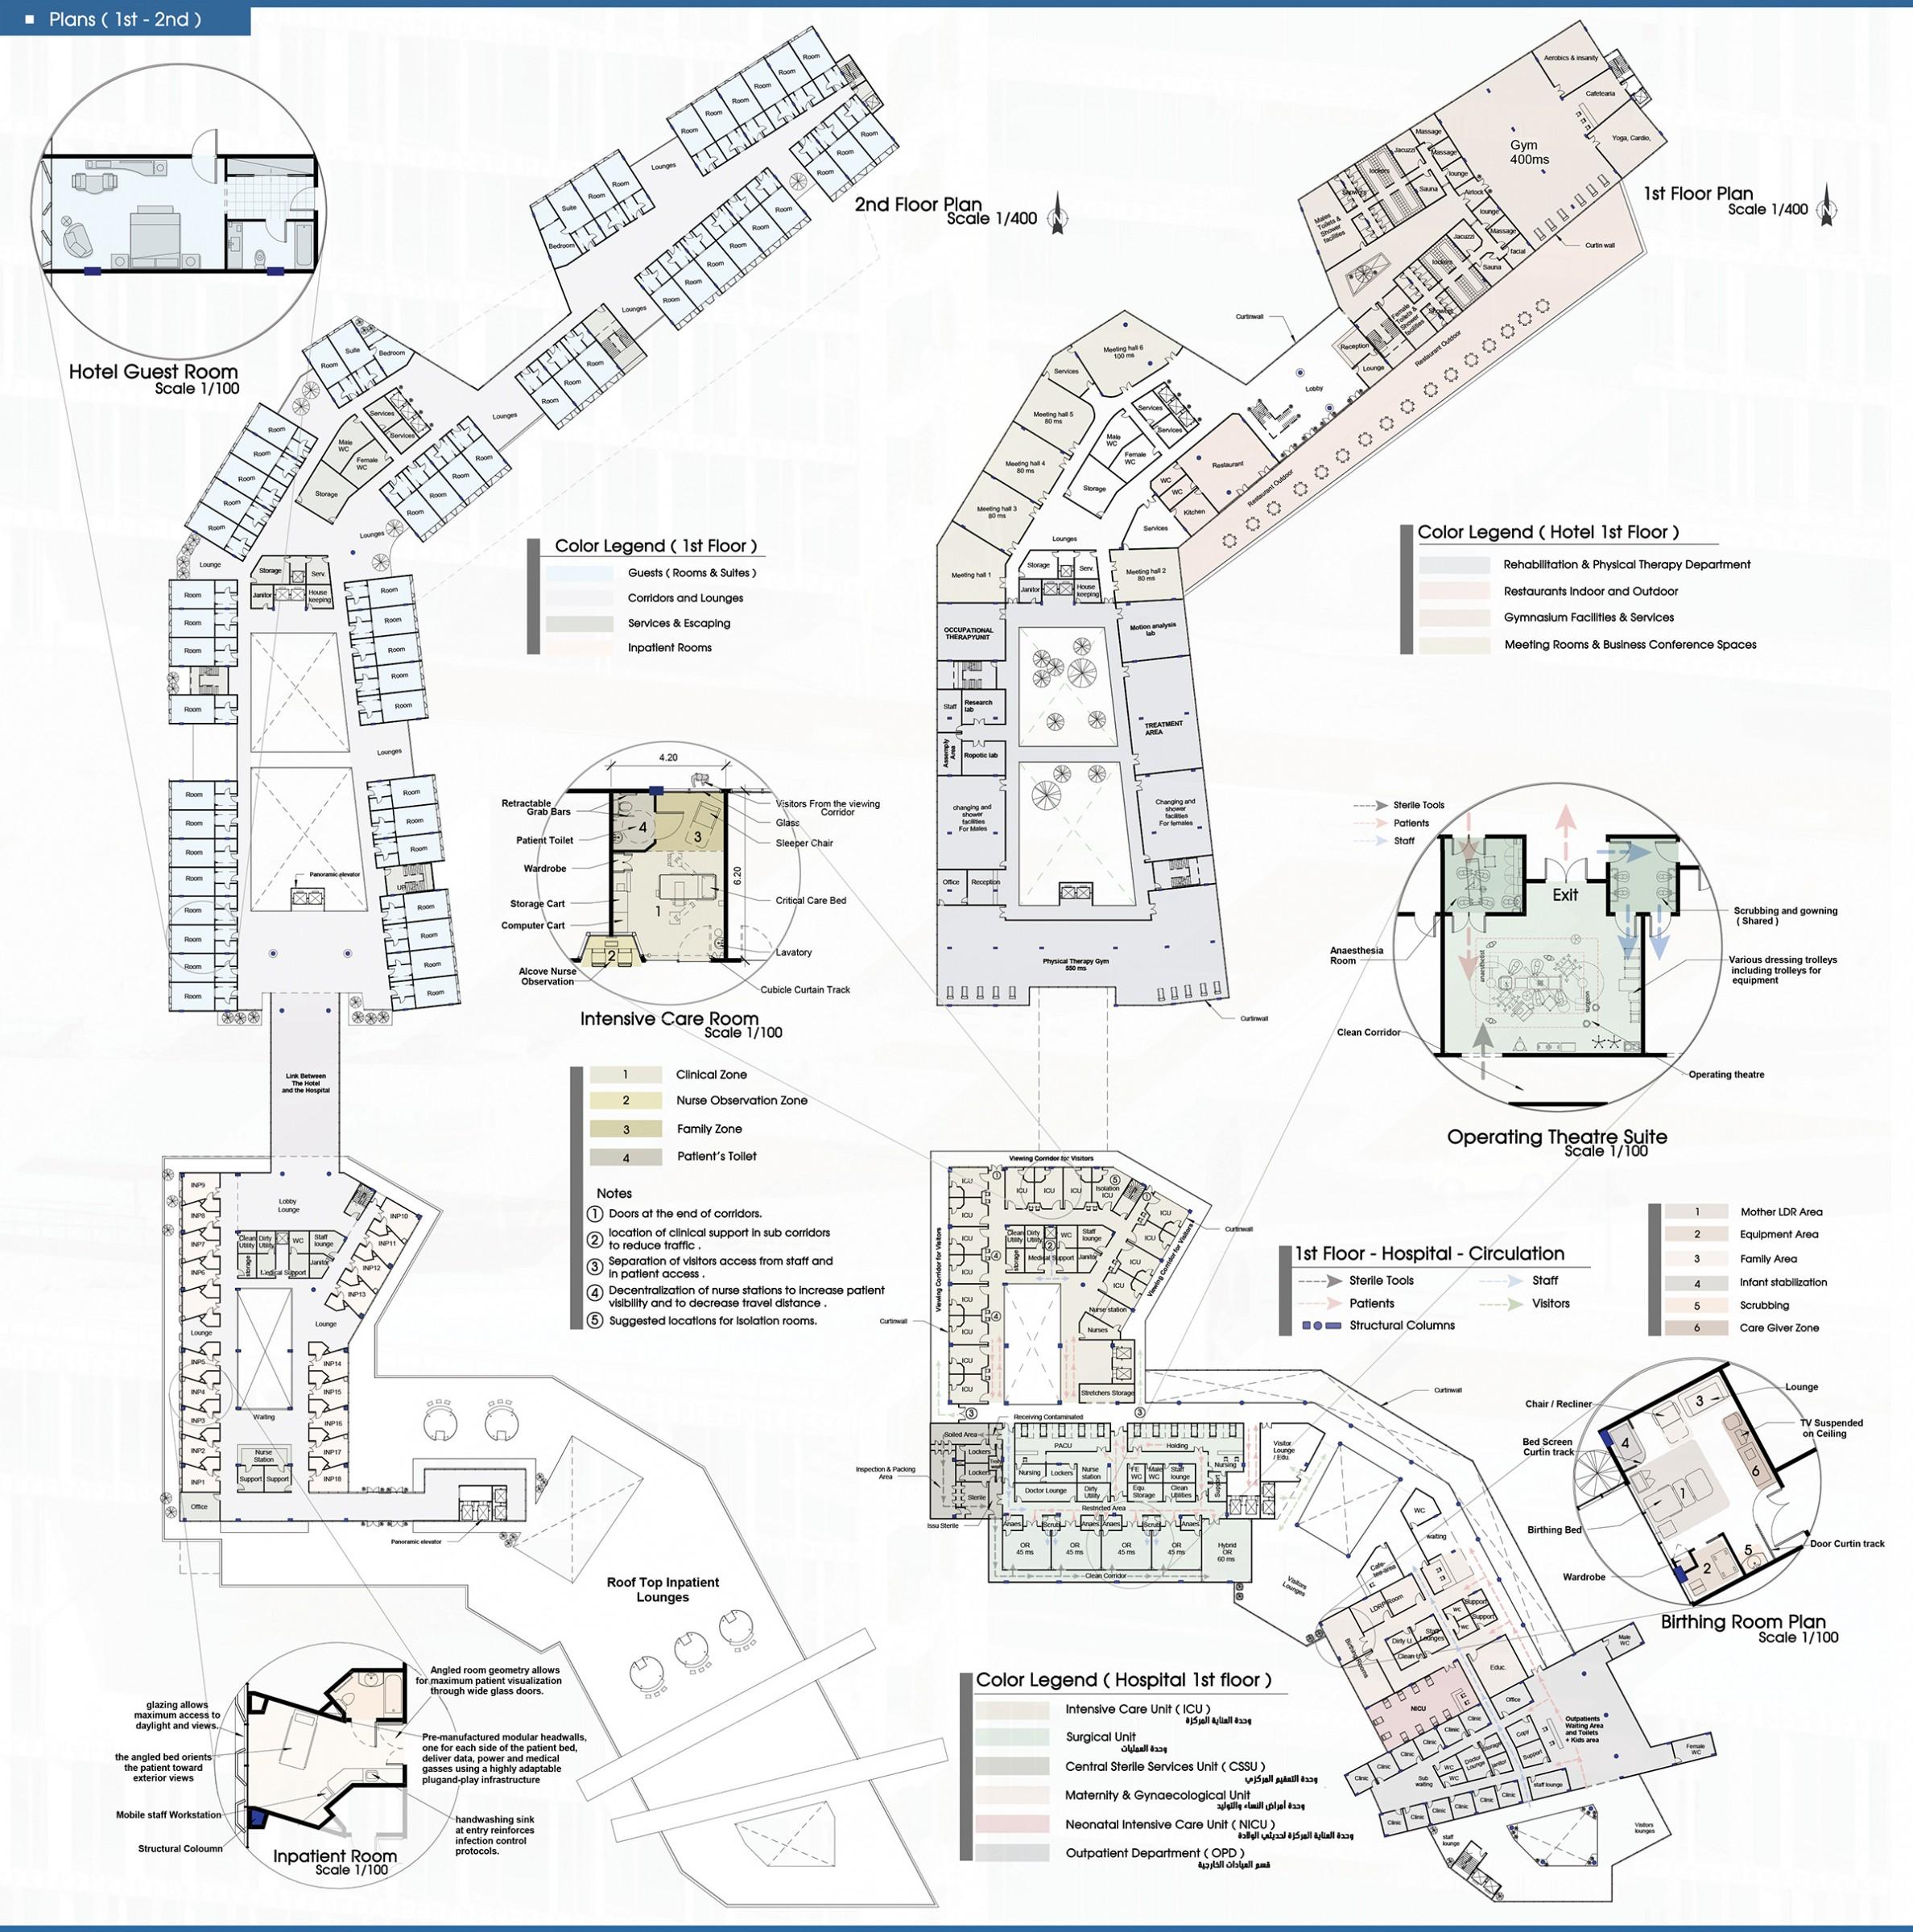 Maternity Hospital Floor Plan: Maternity Hospital Floor Plan Maternity Hospital Floor